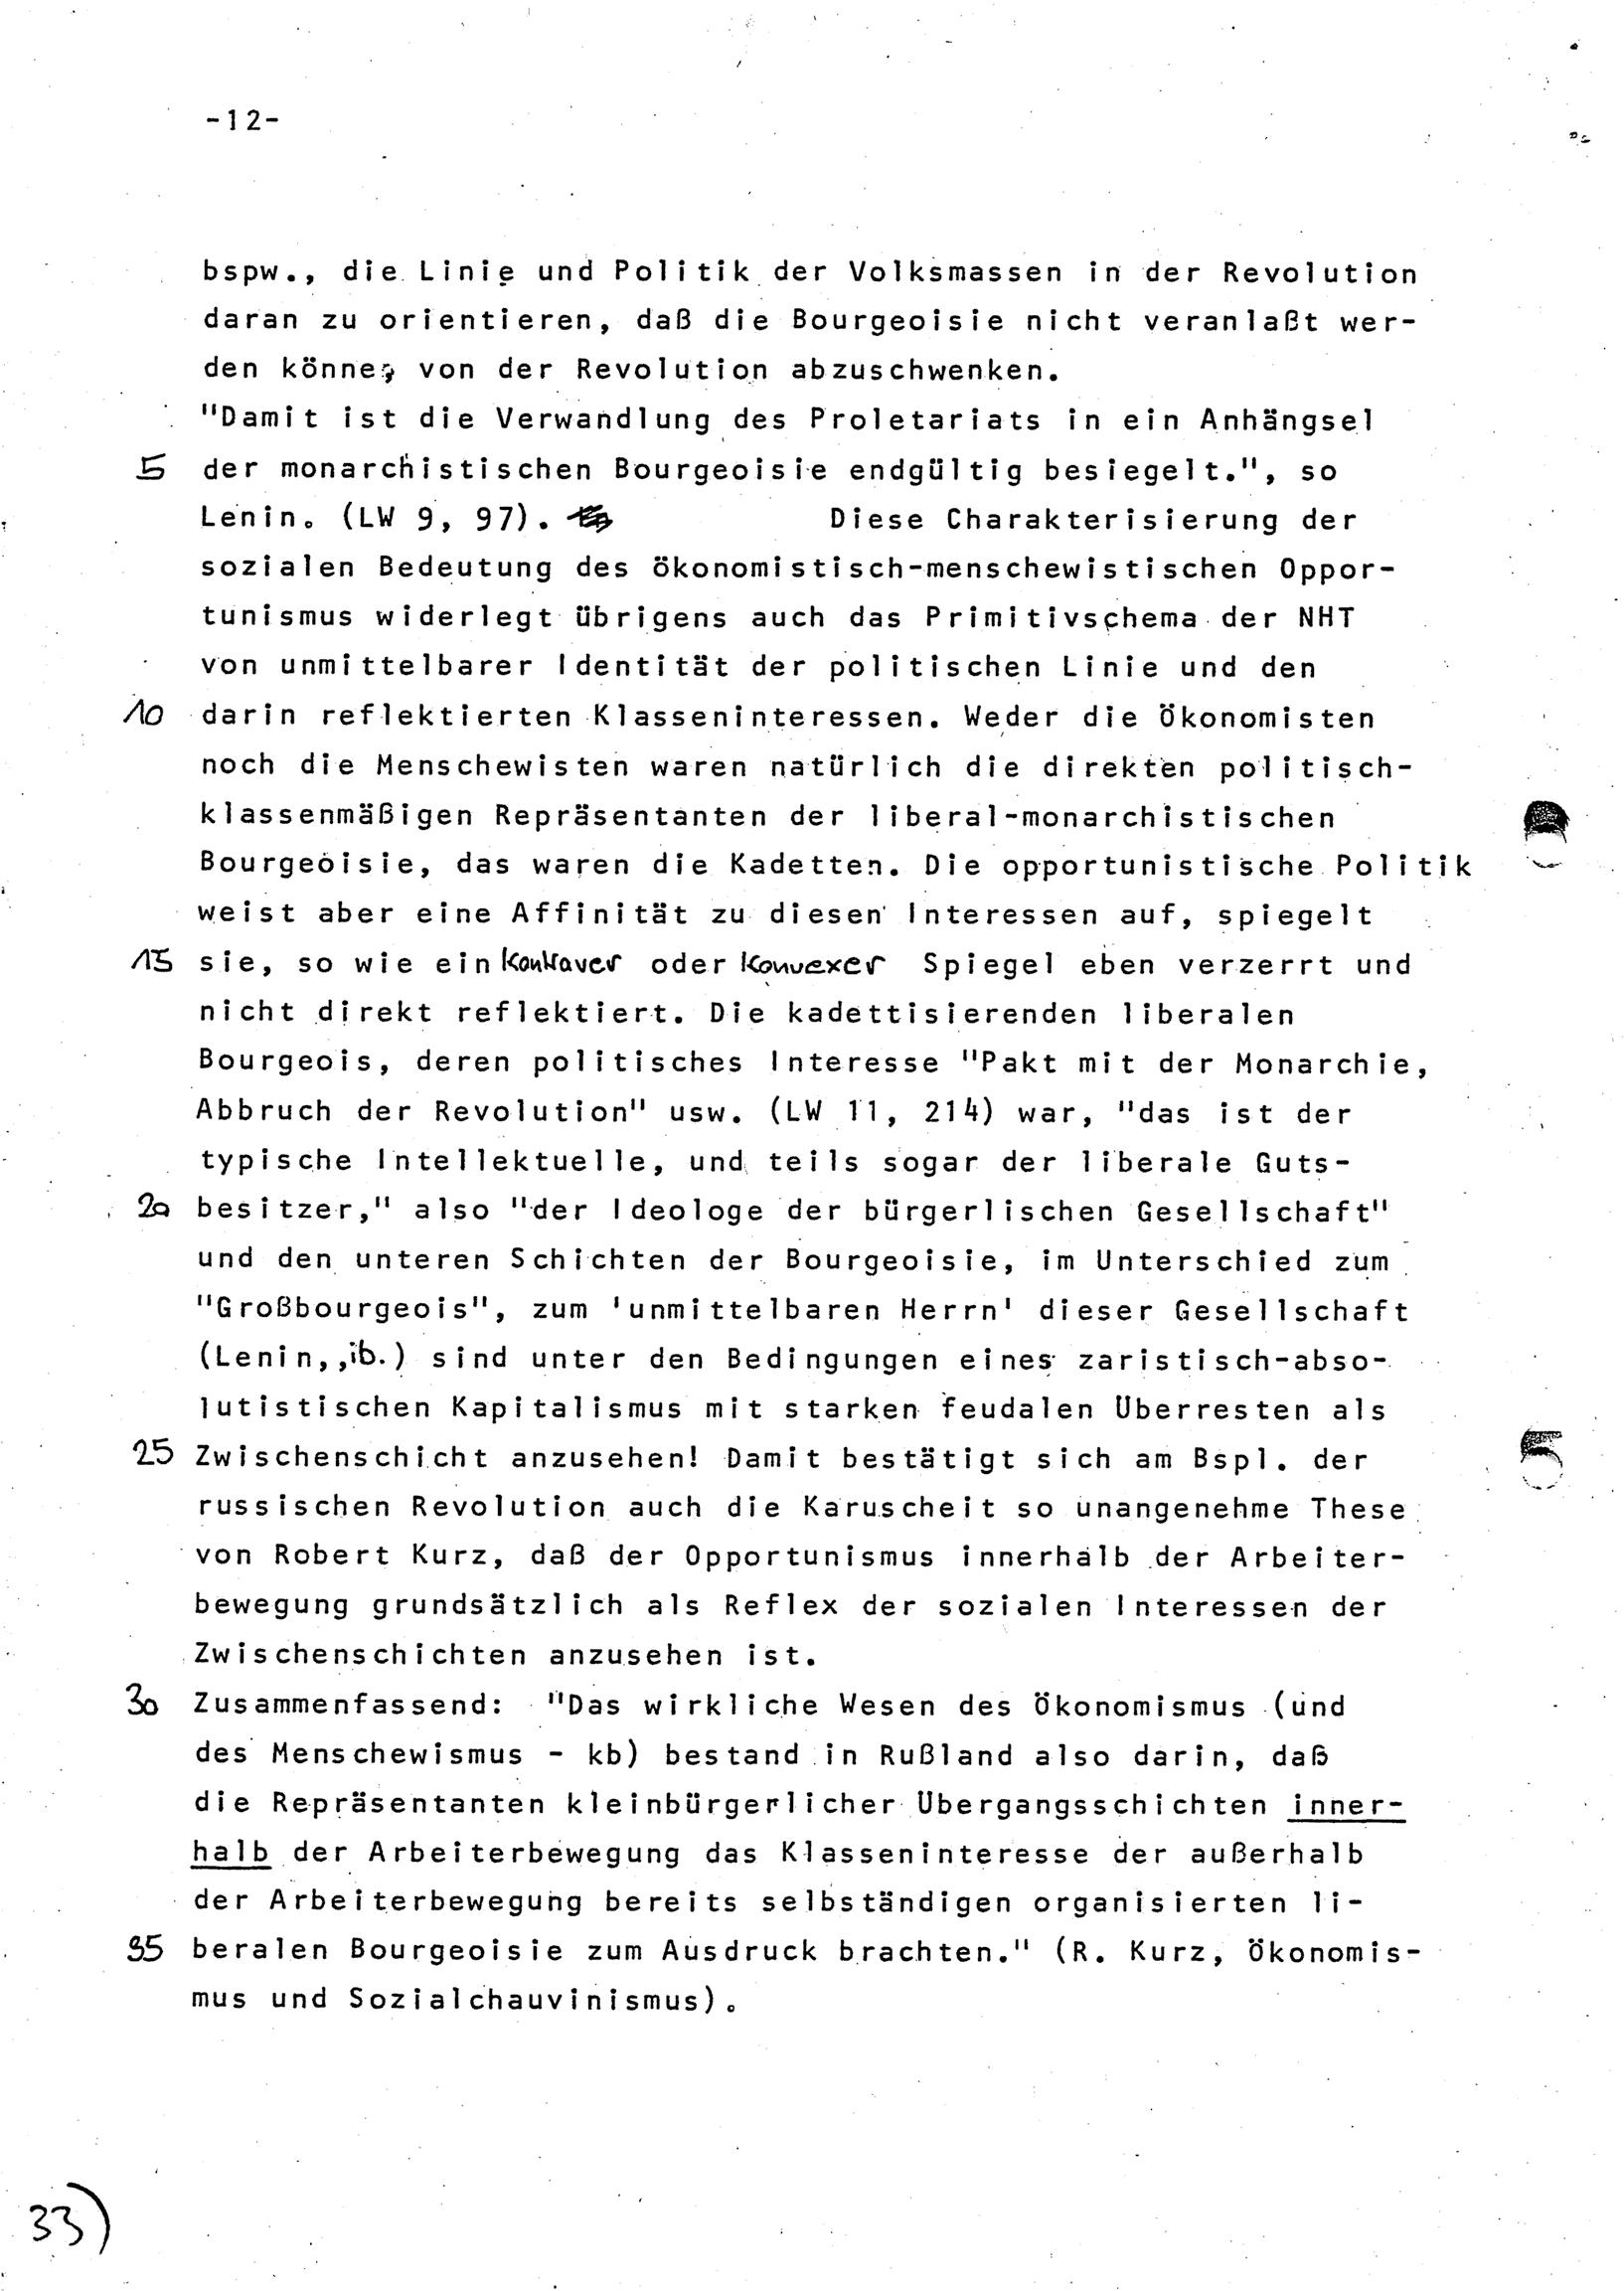 Ulm_KGU_Arbeitsheft_19830425_015_036